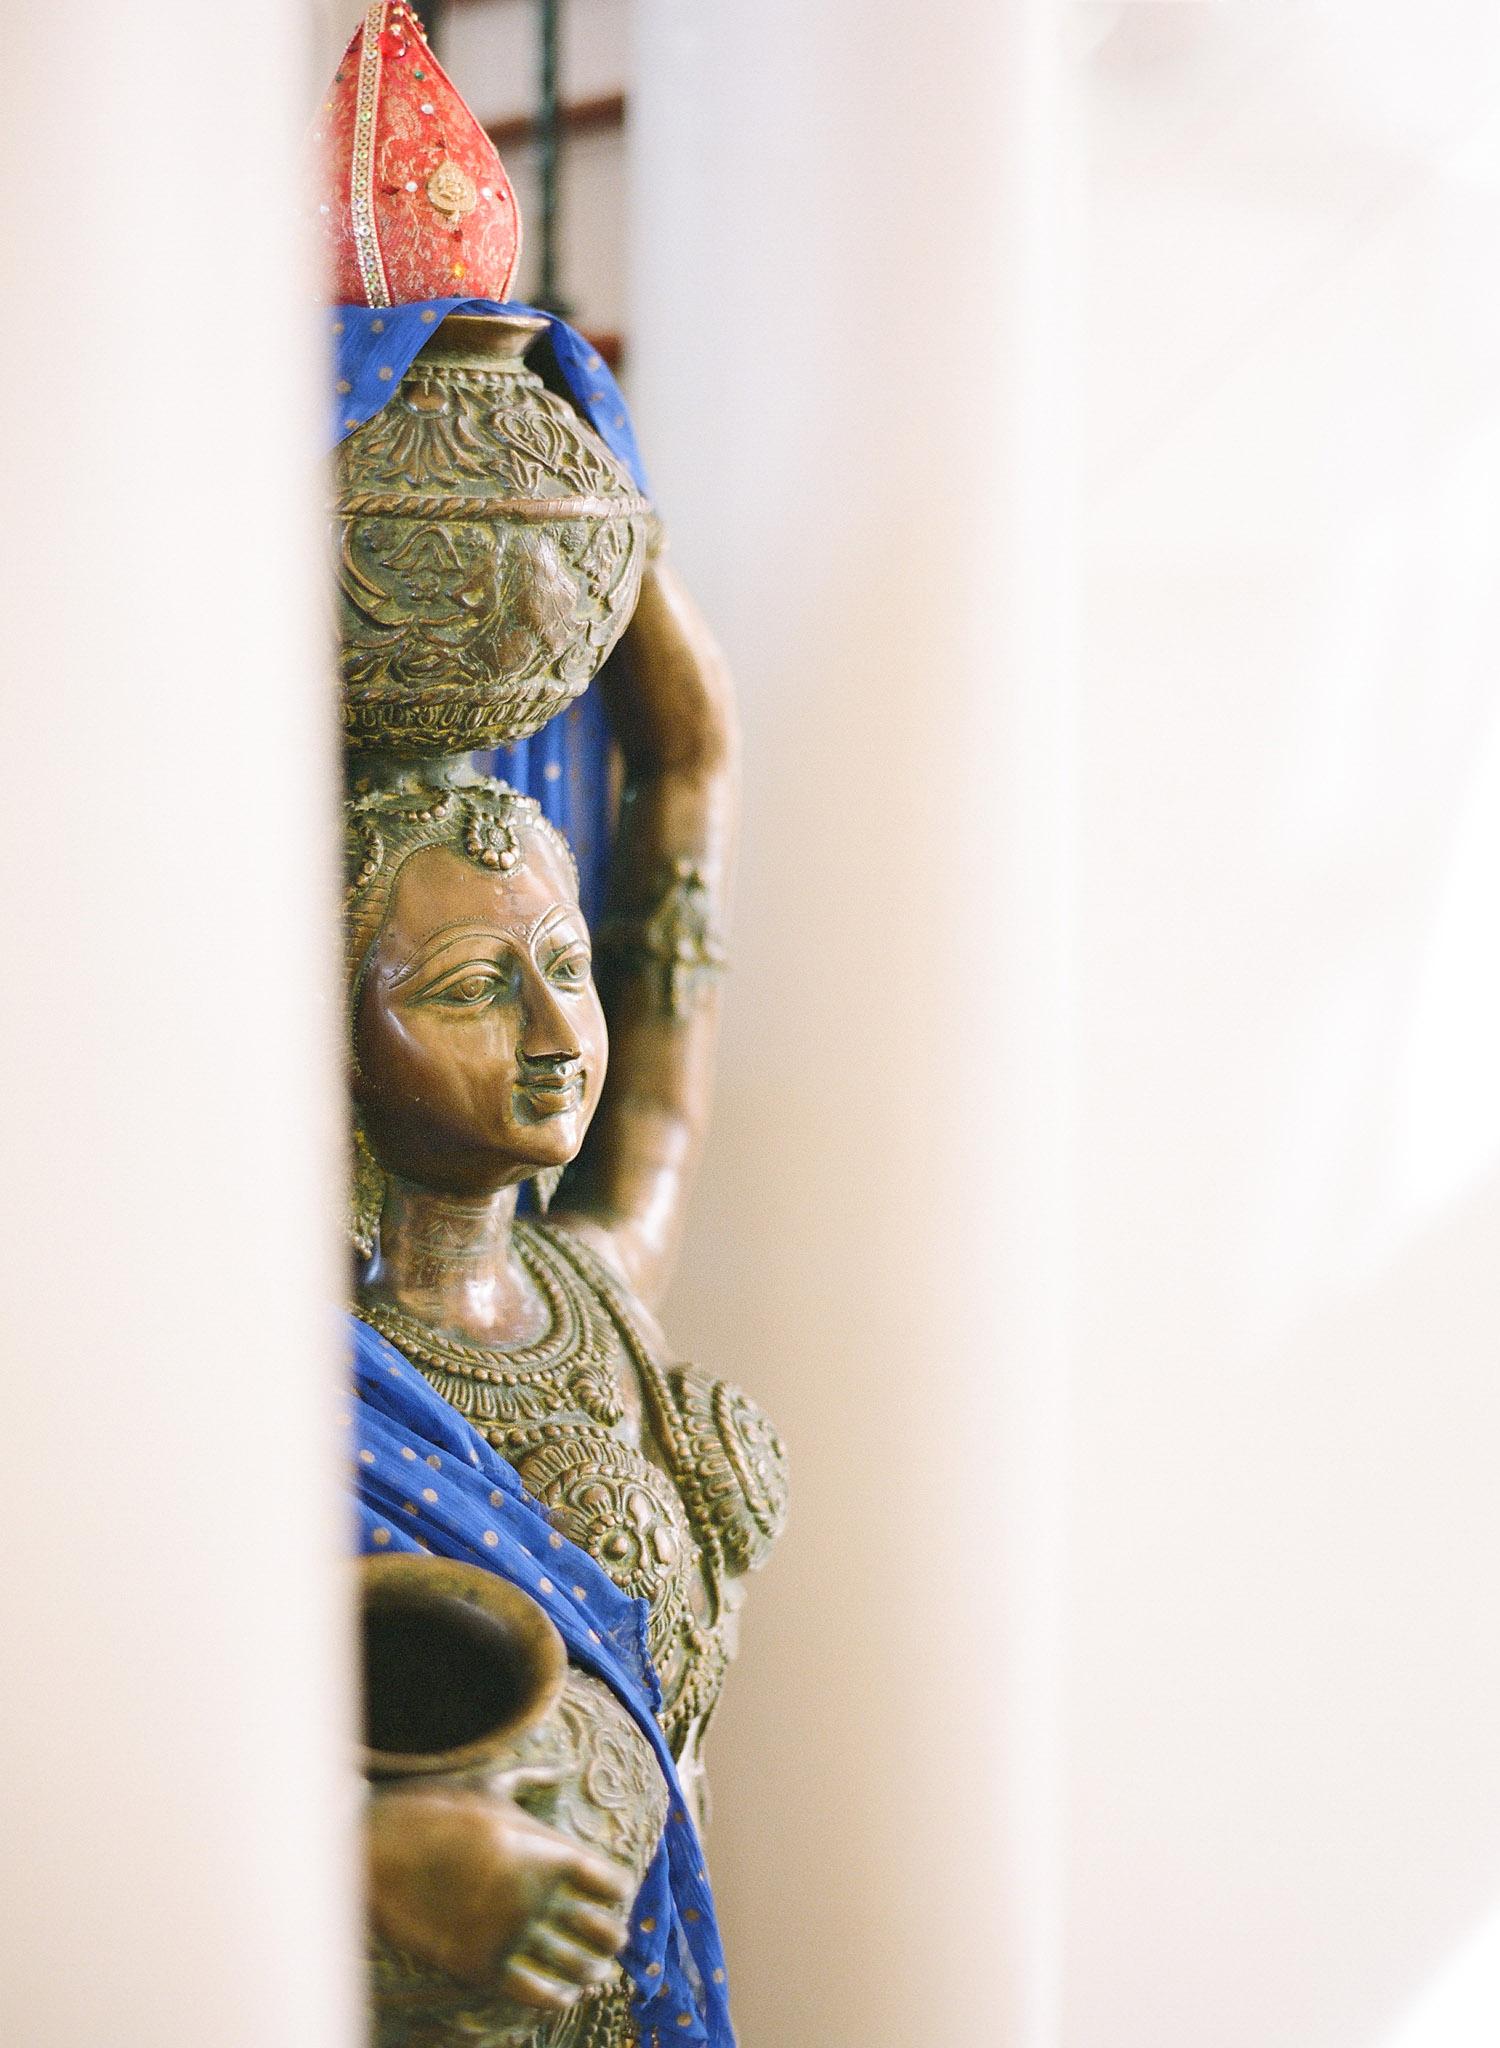 destination wedding photographer Lexia Frank, a top indian wedding photographer, photographed this hindu indian wedding at the hammock beach resort in palm coast florida. lexia is a film photographer for weddings and photographs luxury indian weddings in florida and worldwide.